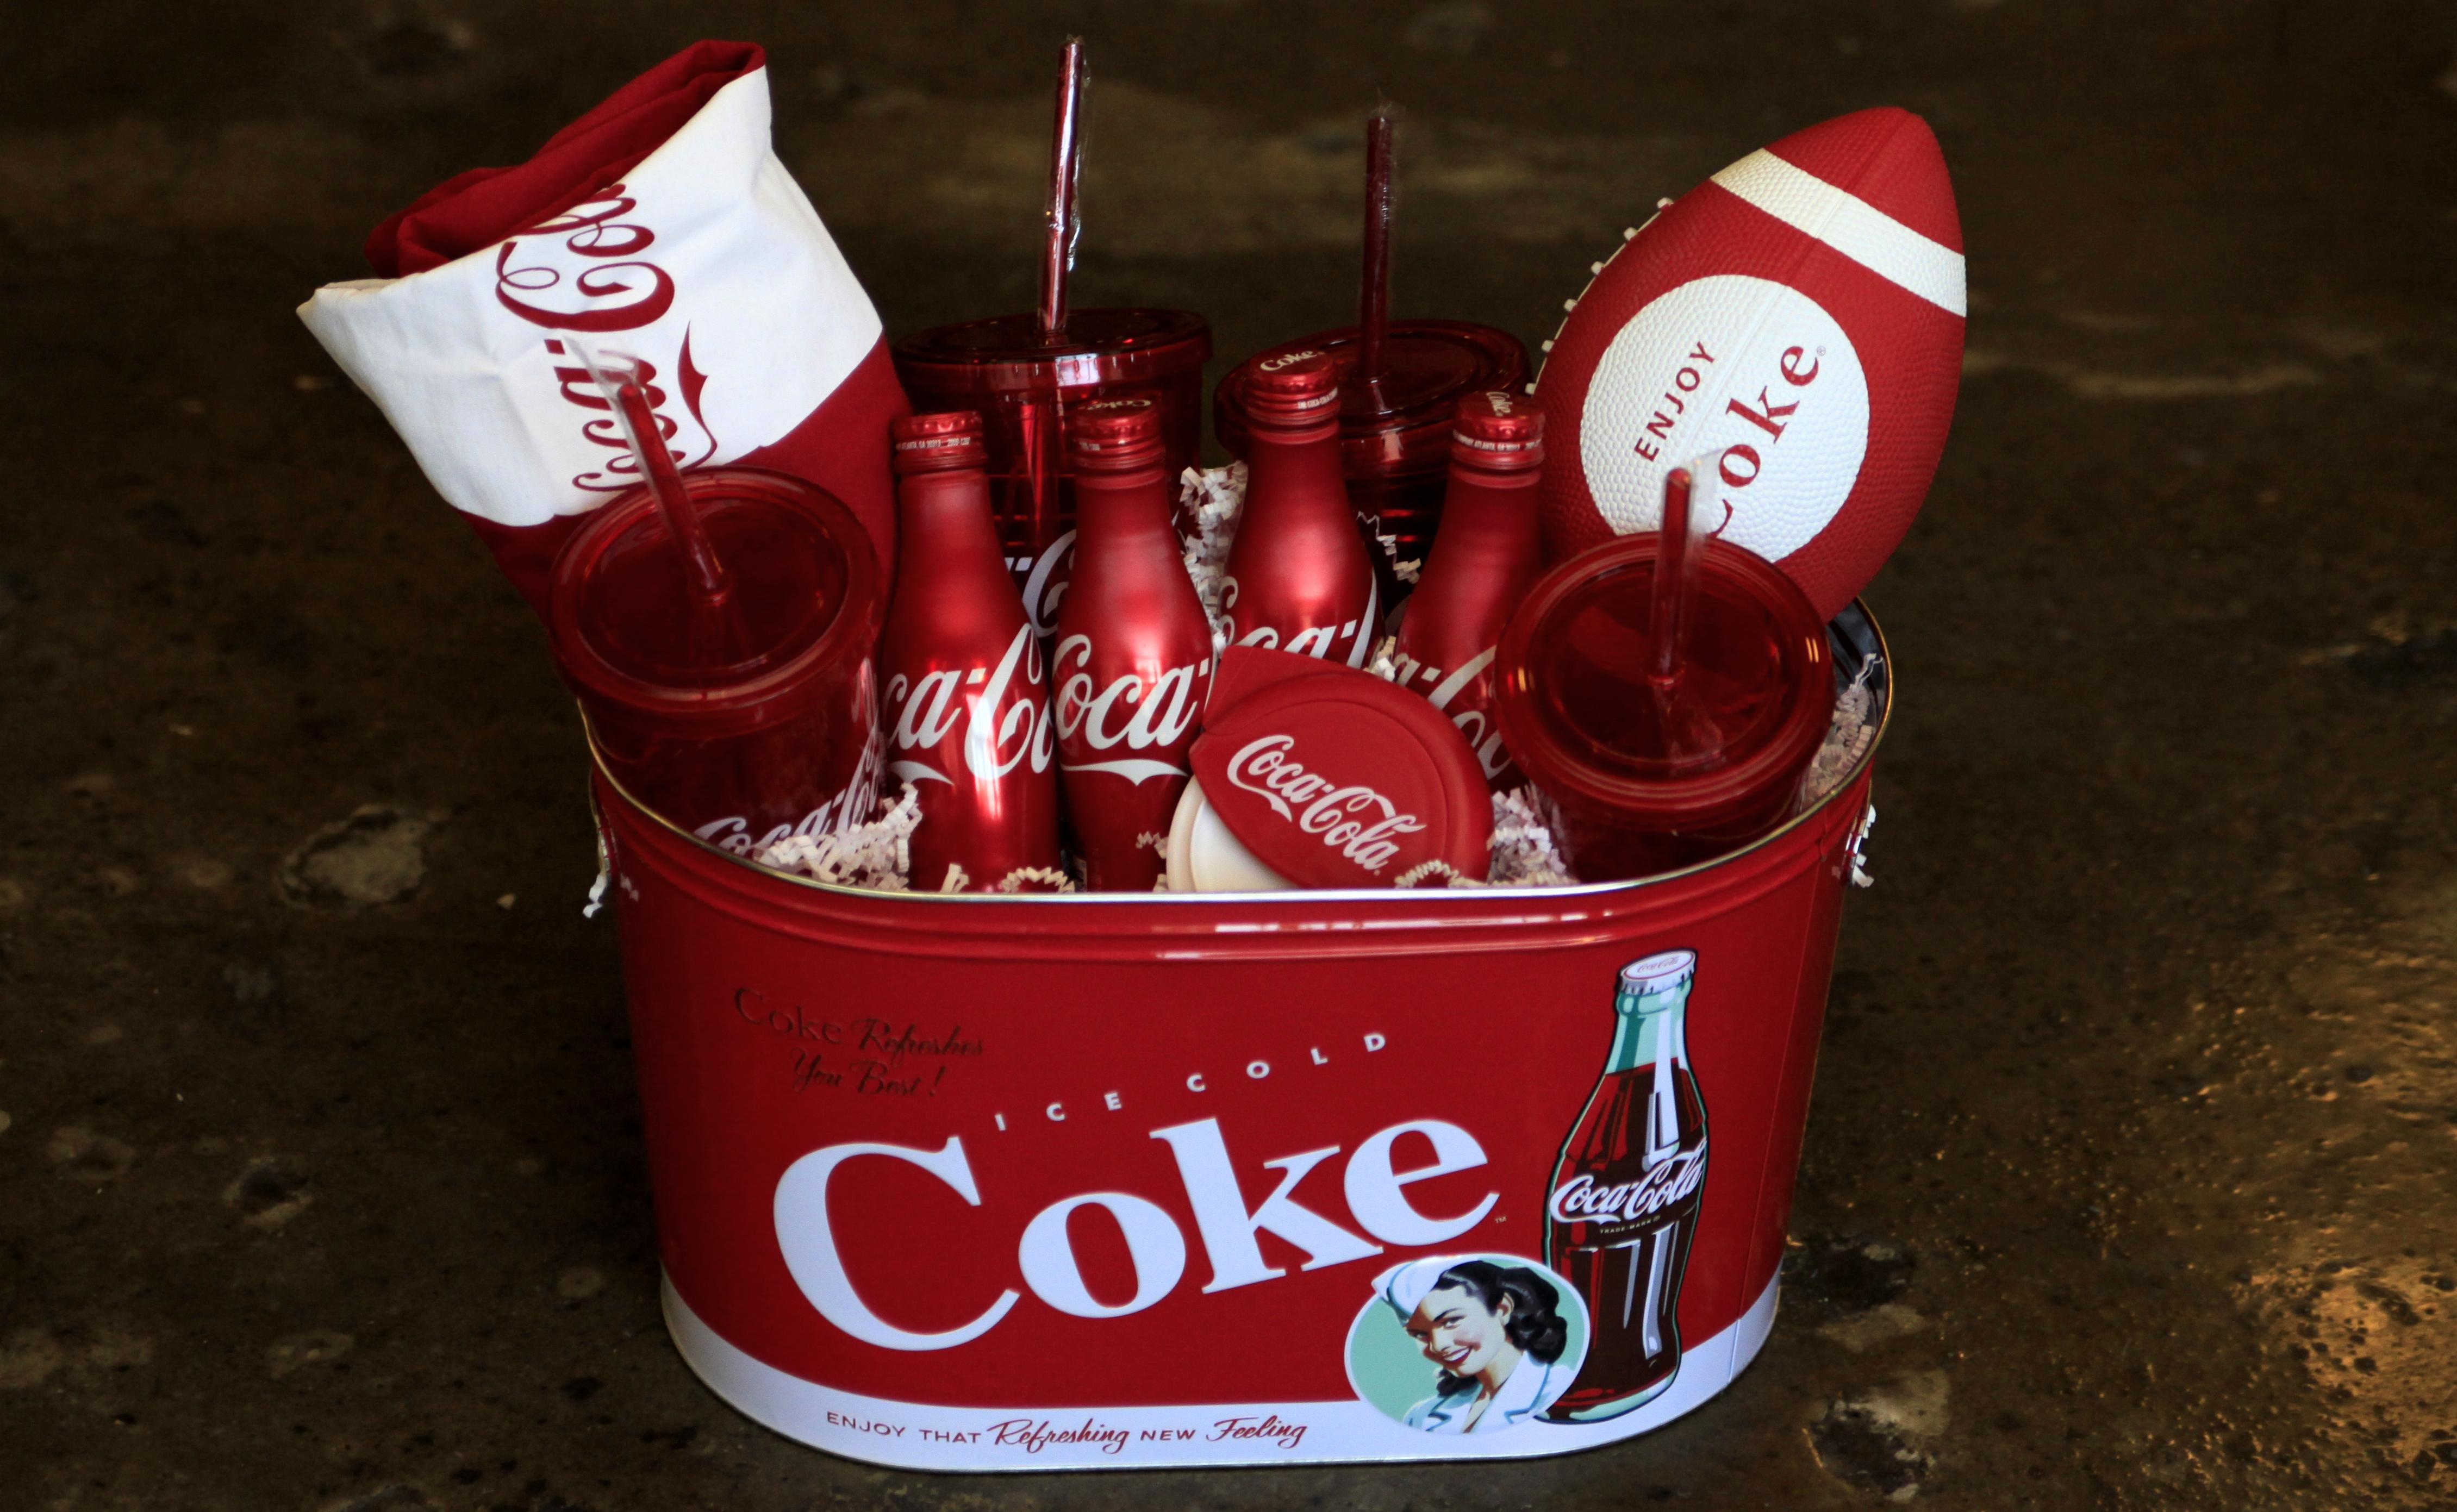 Coca Cola Superbowl Ad Sneak Peak Prize Pack Giveaway